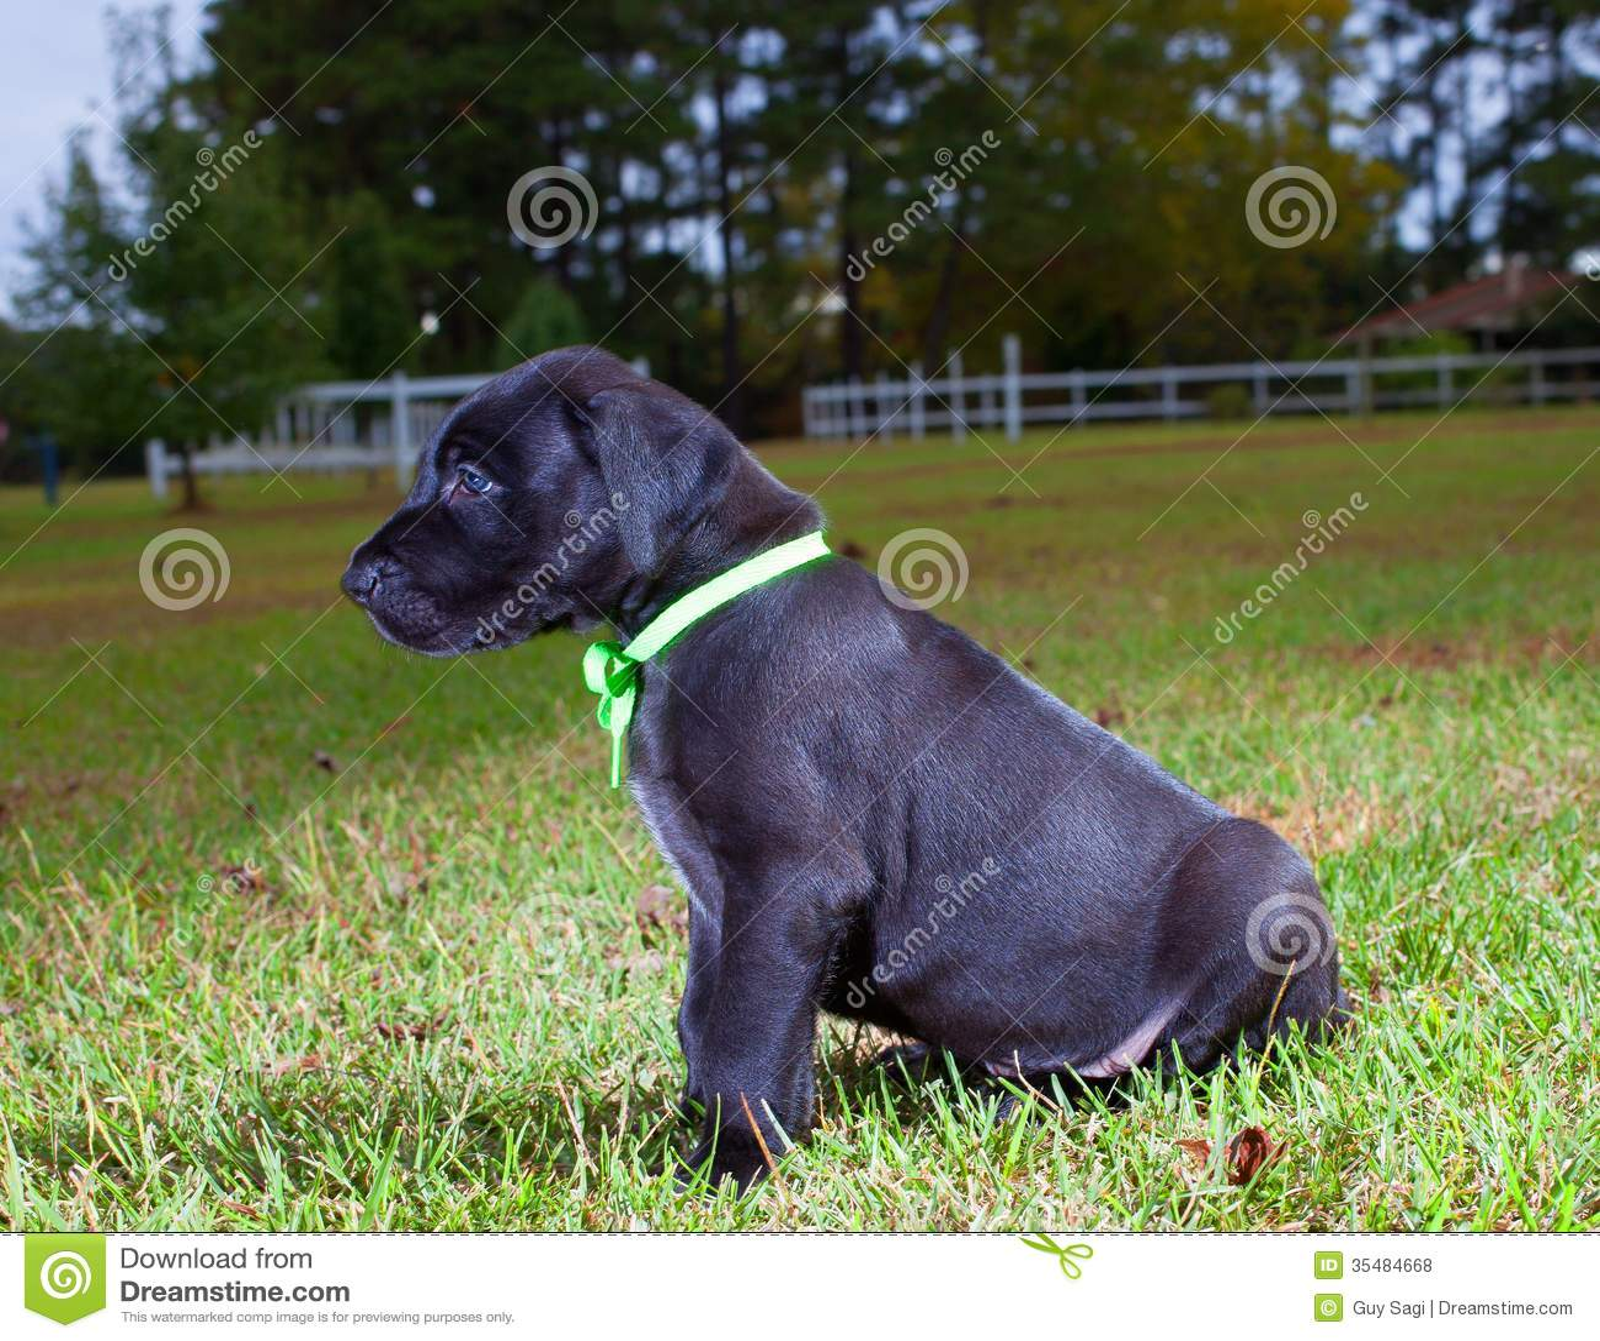 Black Great Dane Puppy Black great Dane puppy that is